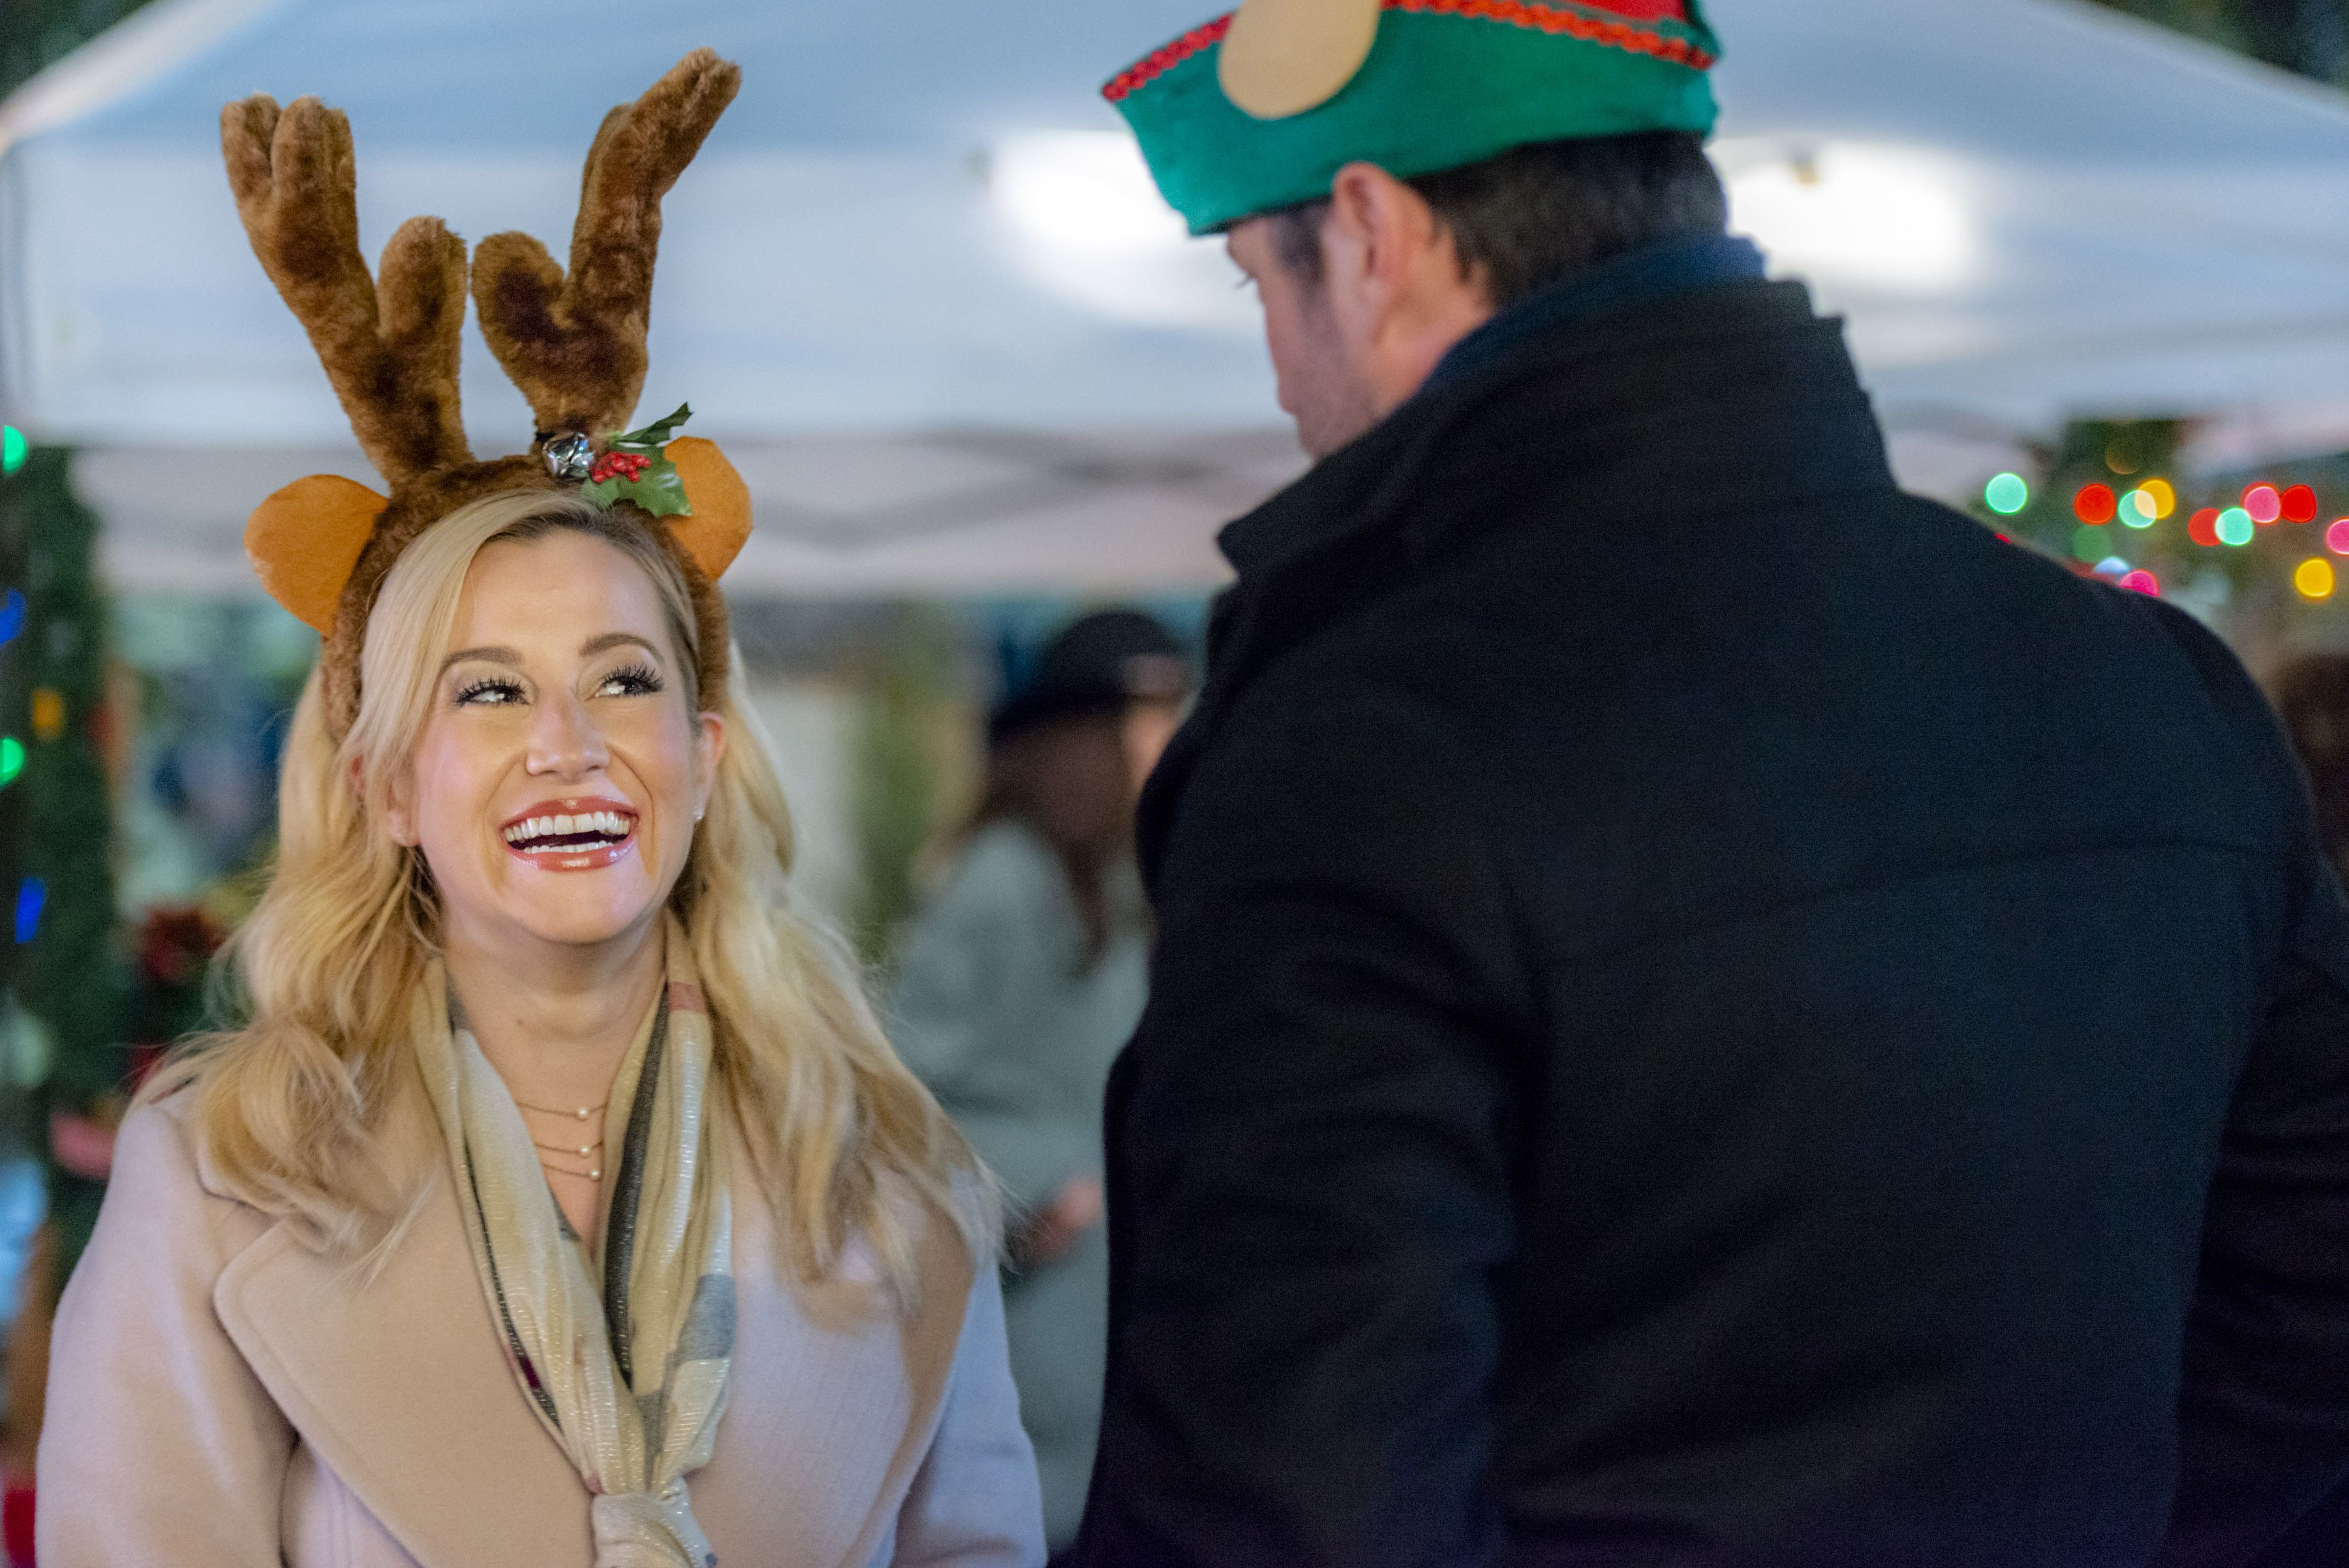 Kellie Pickler's New Hallmark Movie 'Wedding at Graceland' Is Hiring